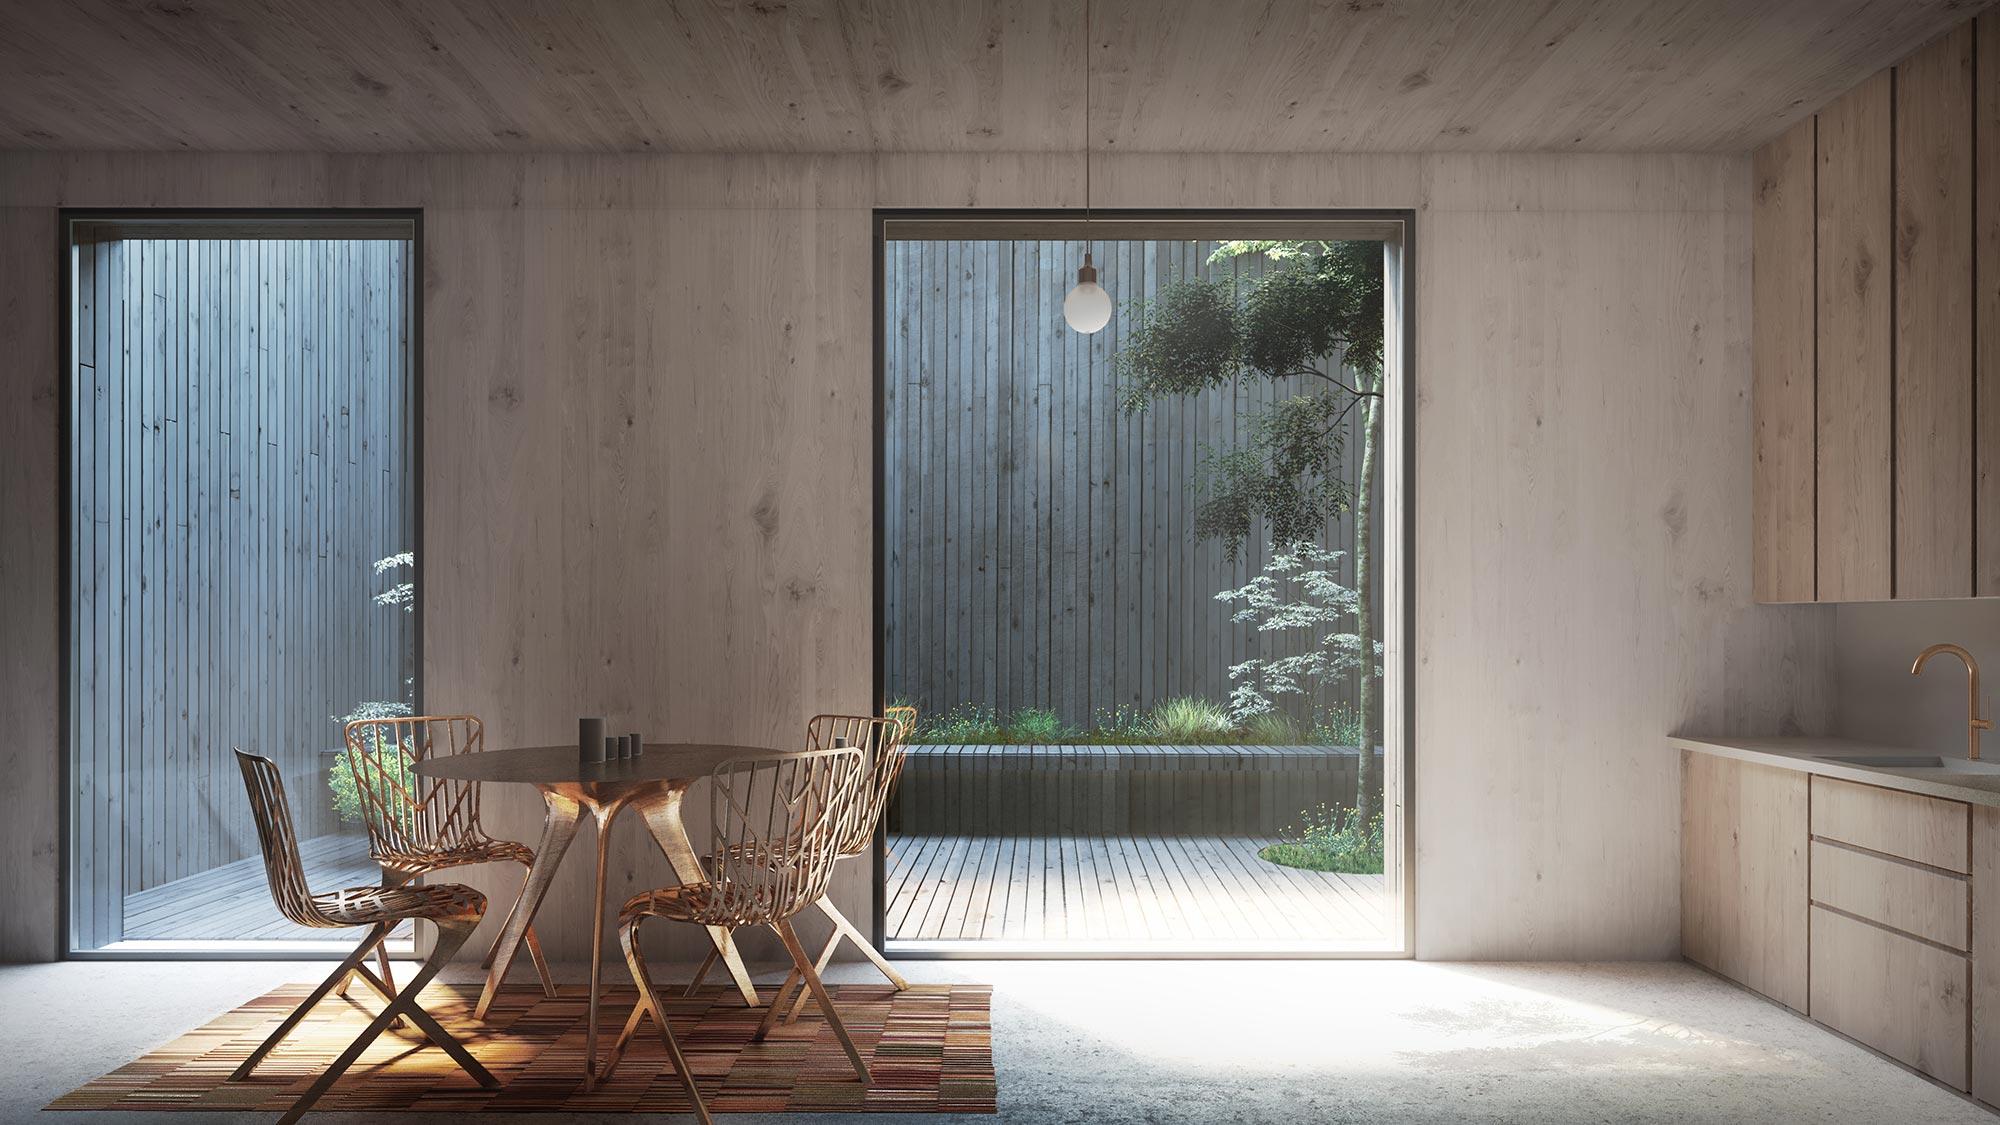 mbelhaus salzburg affordable beautiful great free perfect erasmus experience in frankfurt am. Black Bedroom Furniture Sets. Home Design Ideas